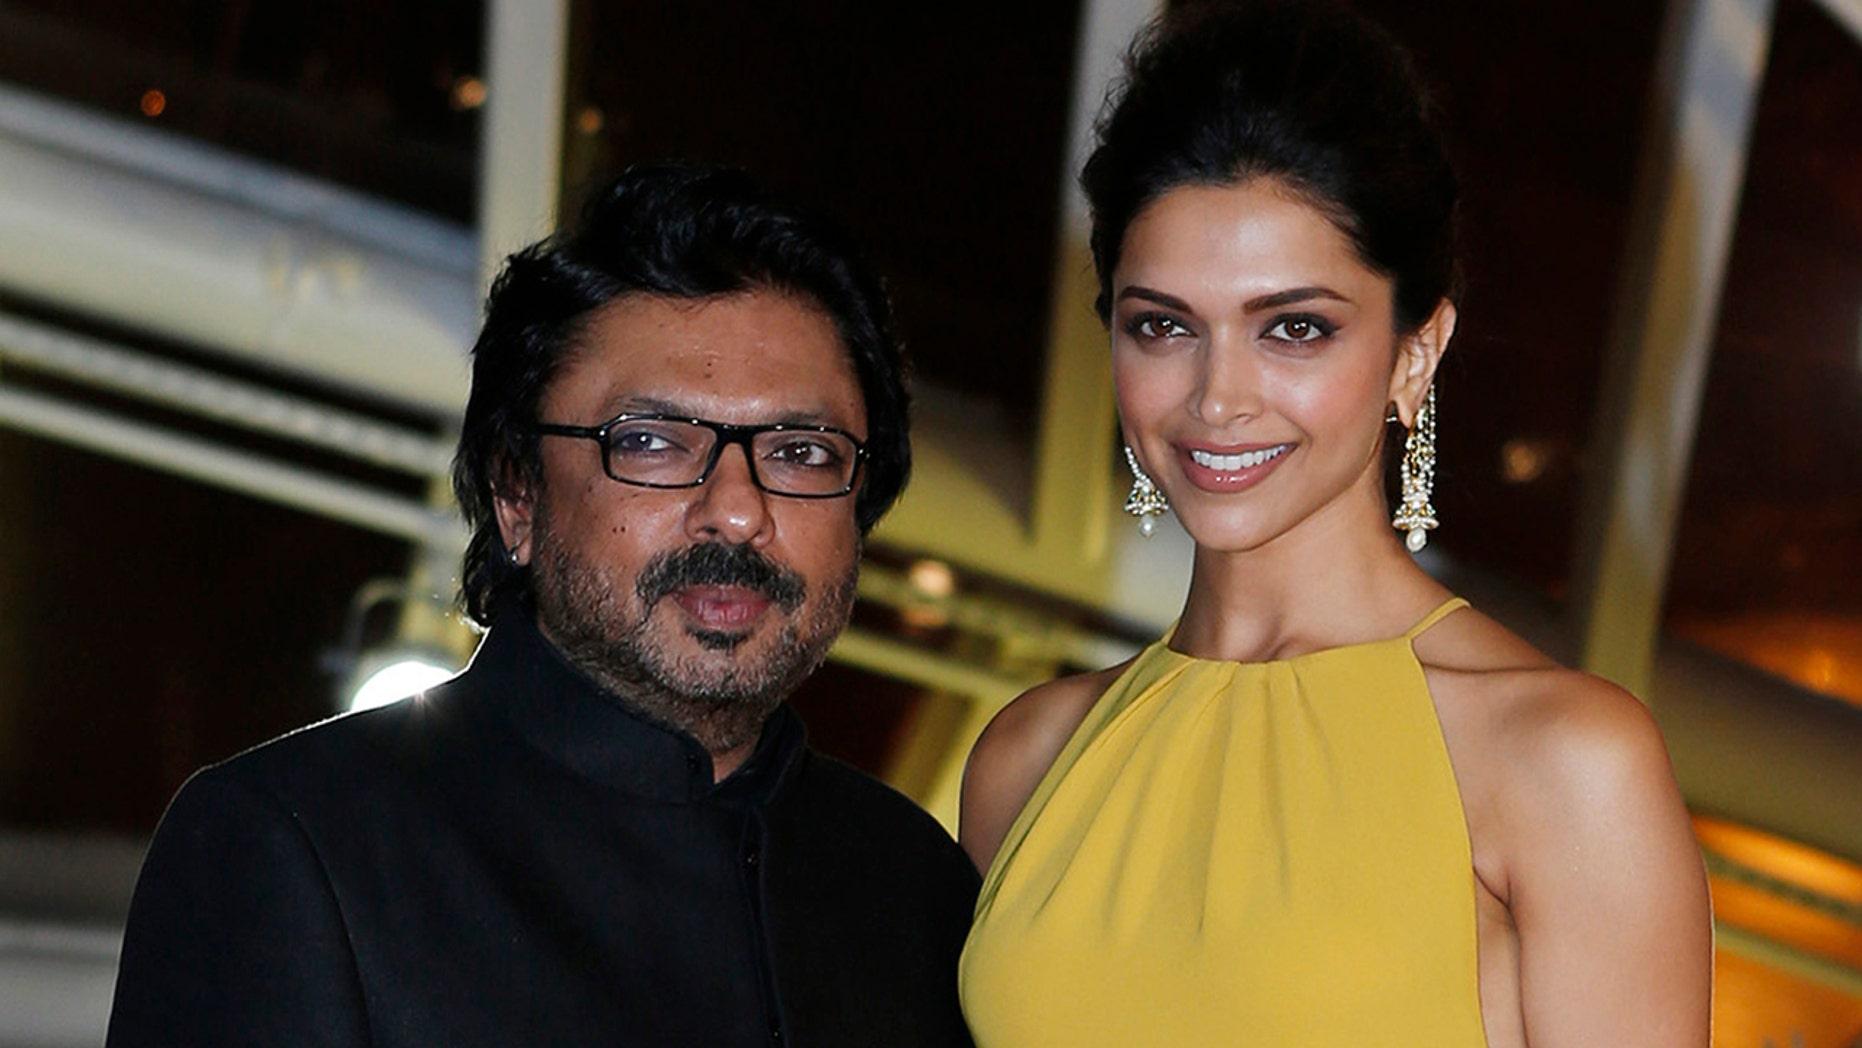 Deepika Padukone, right, and director Sanjay Leela Bhansali attend the opening of the 13th annual Marrakech International Film Festival.